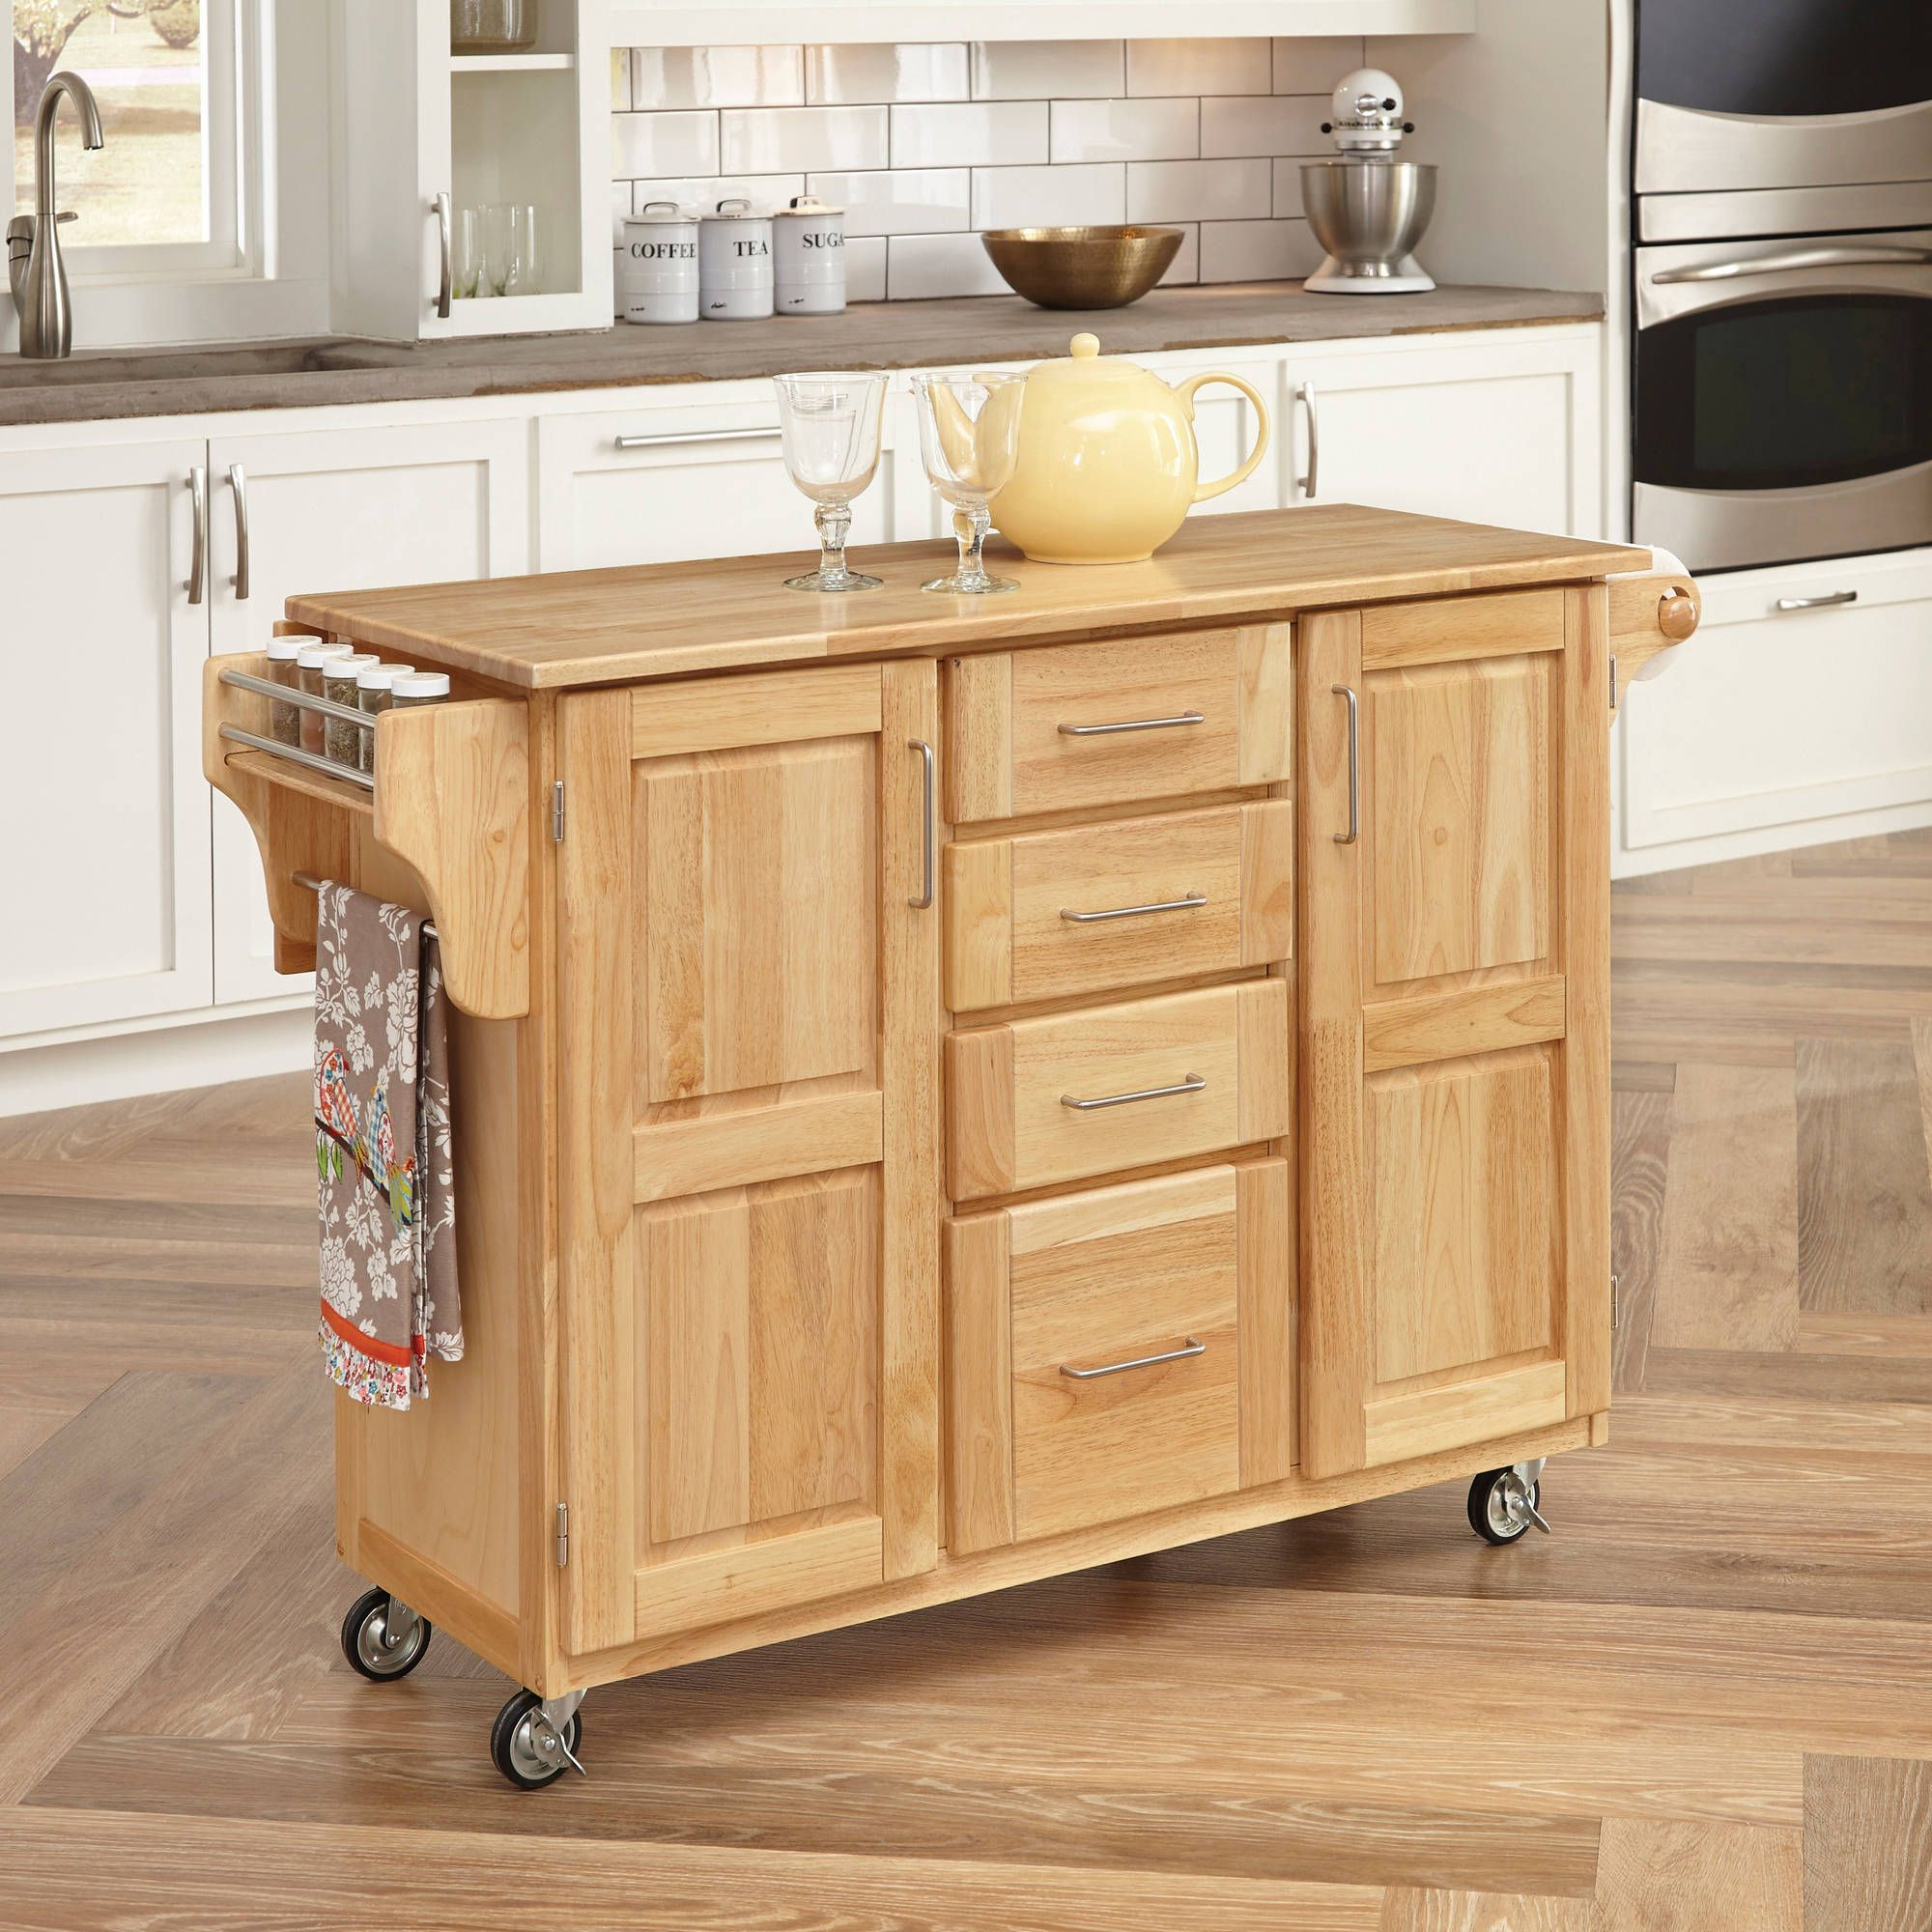 Mainstays Kitchen Cart With Drawer Spice Rack Towel Bar Butcher Block Top White Walmart Com Breakfast Bar Kitchen Kitchen Furniture Kitchen Island On Wheels